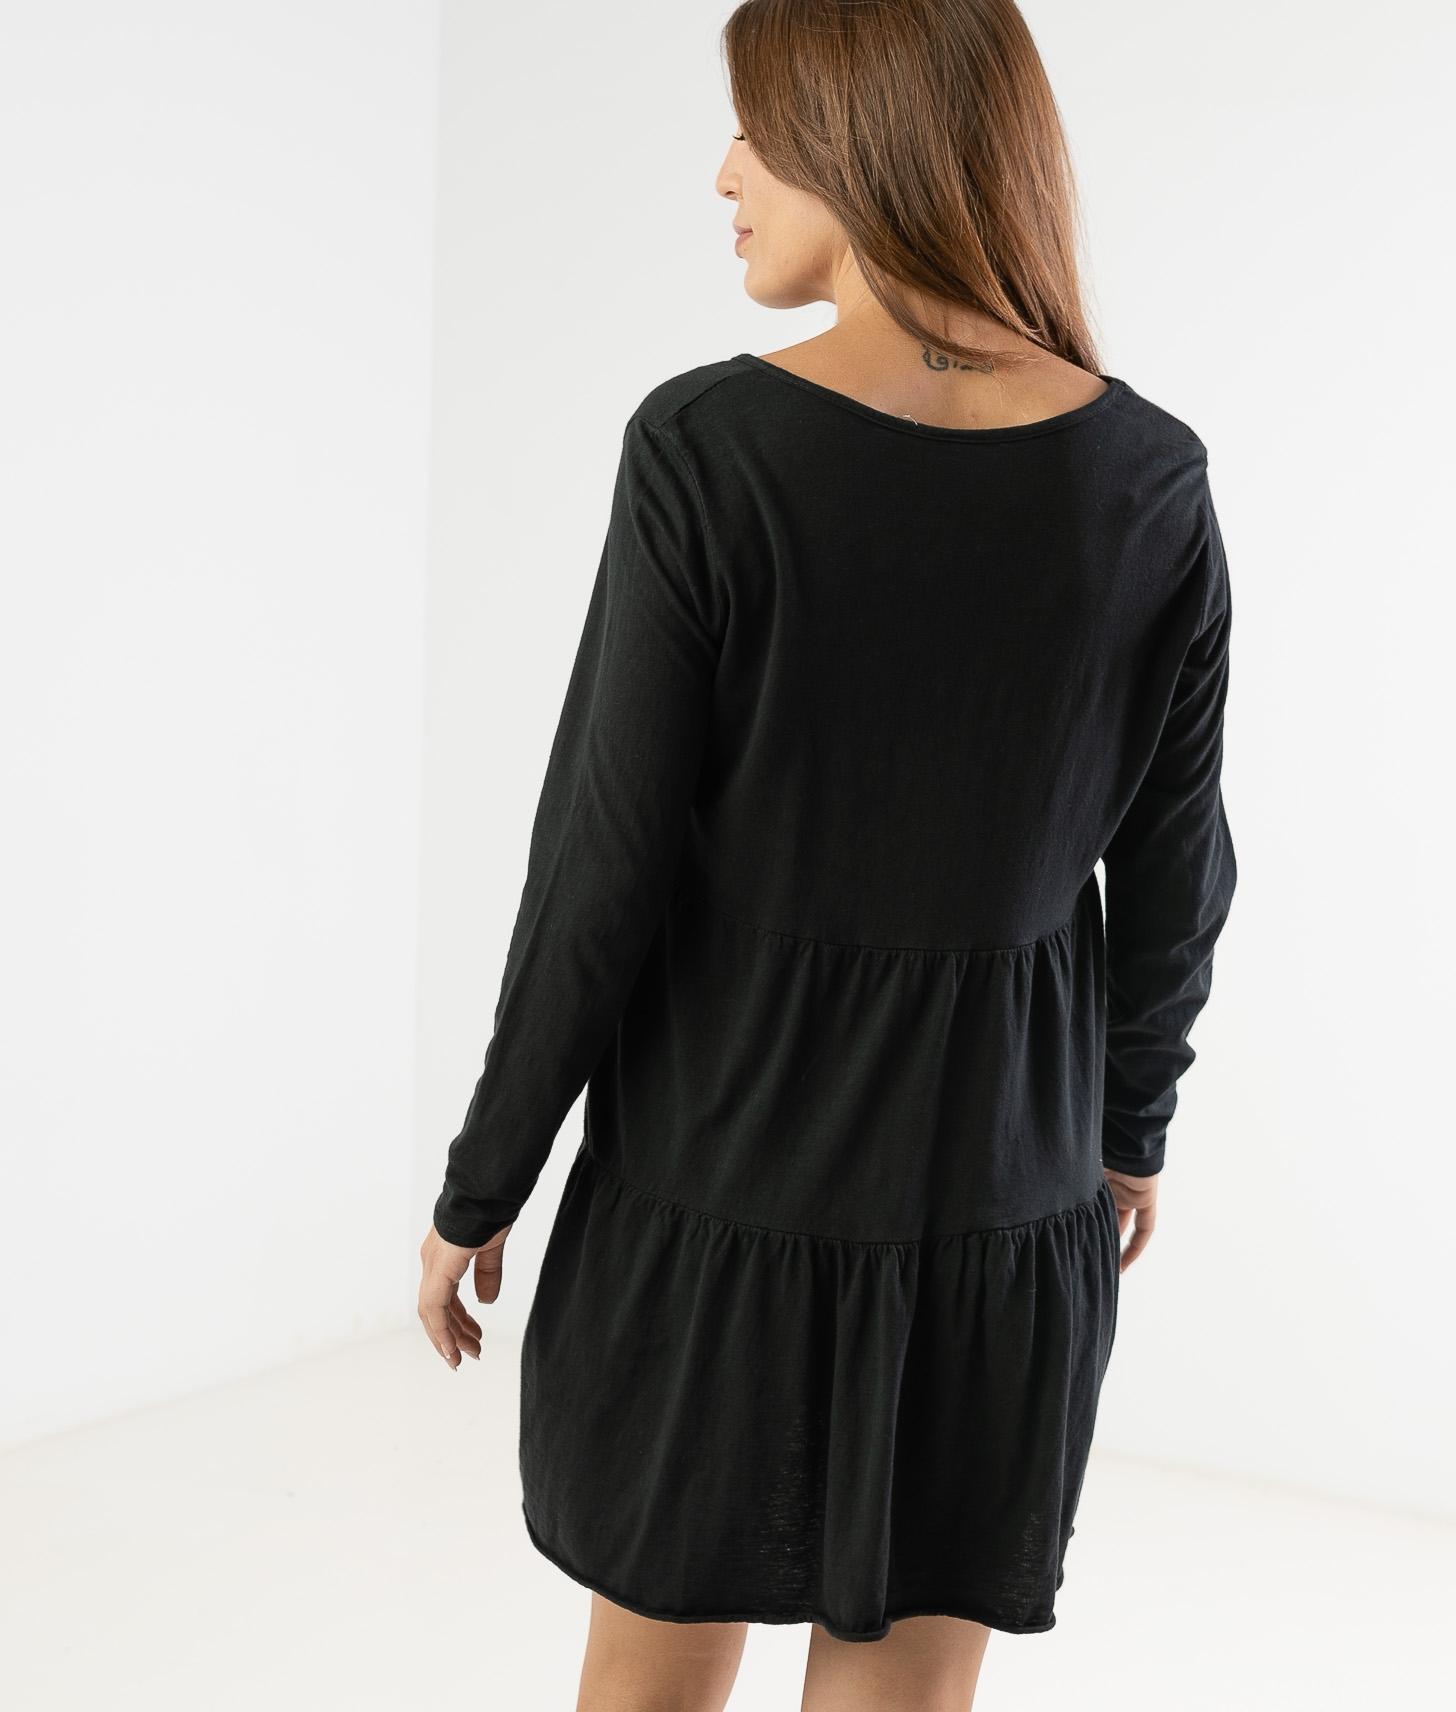 CIMERA DRESS - BLACK